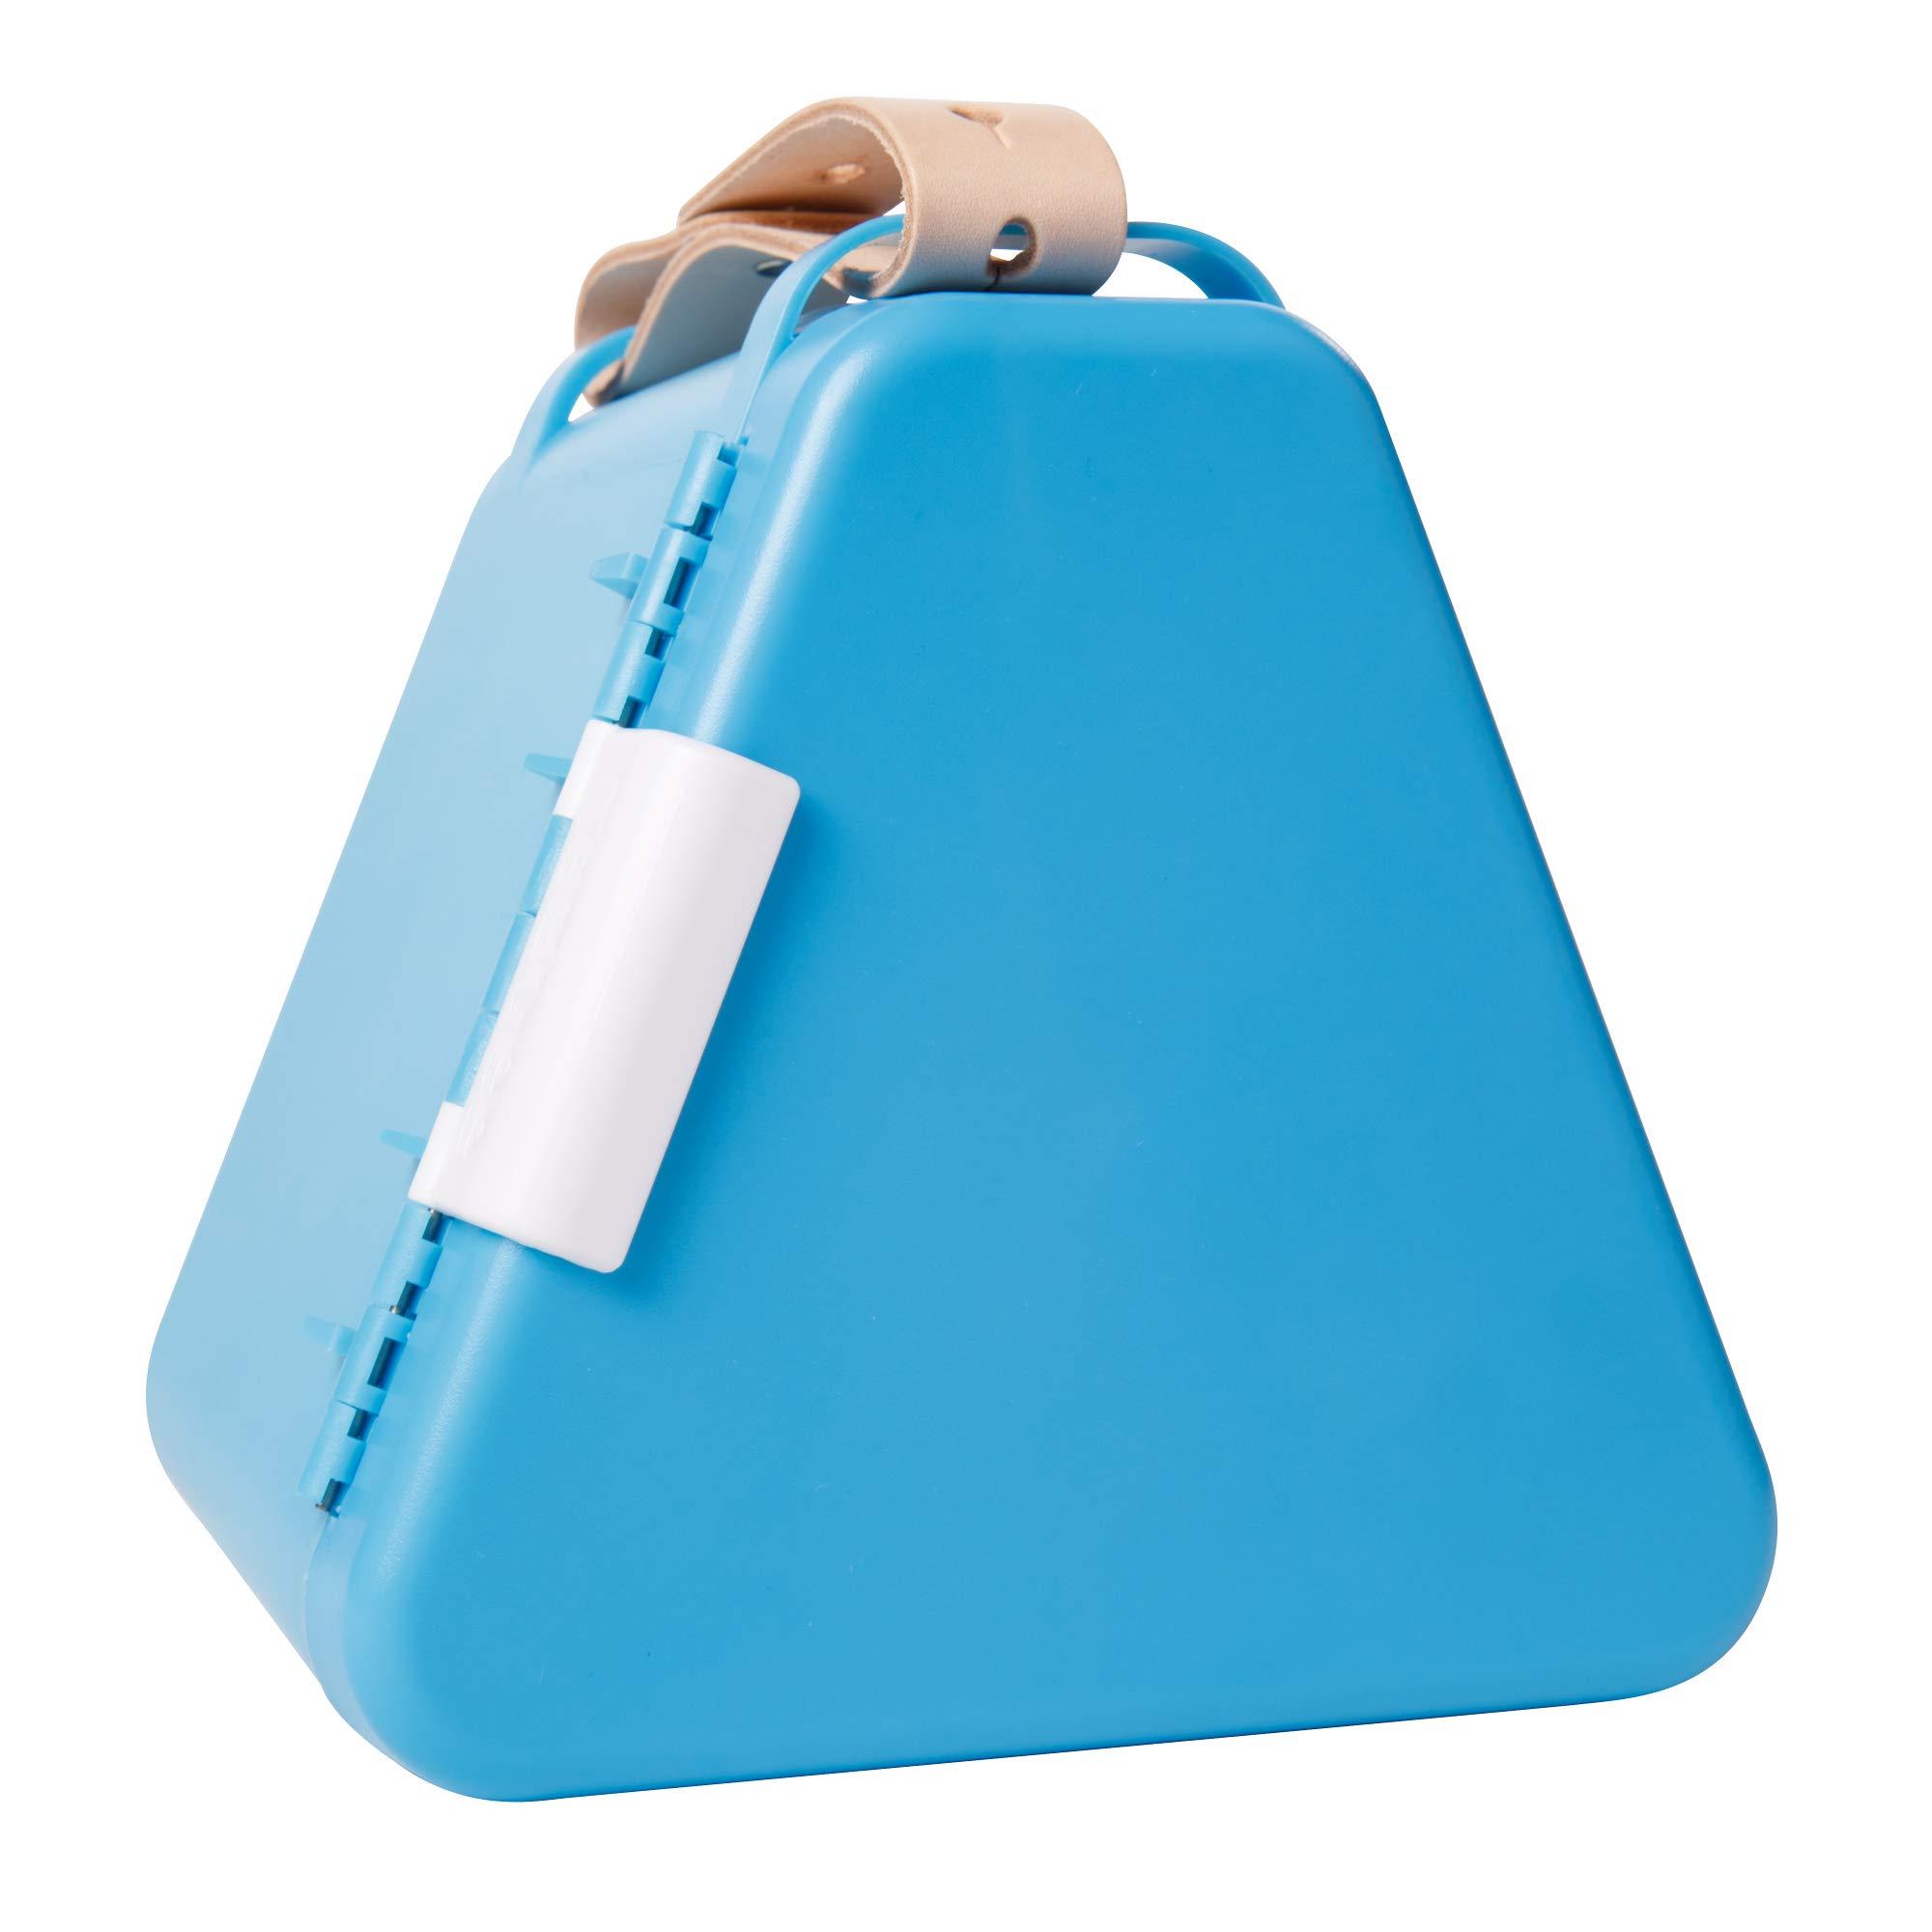 Fat Brain Toys Teebee - Play & Store Toy Box - Light Blue